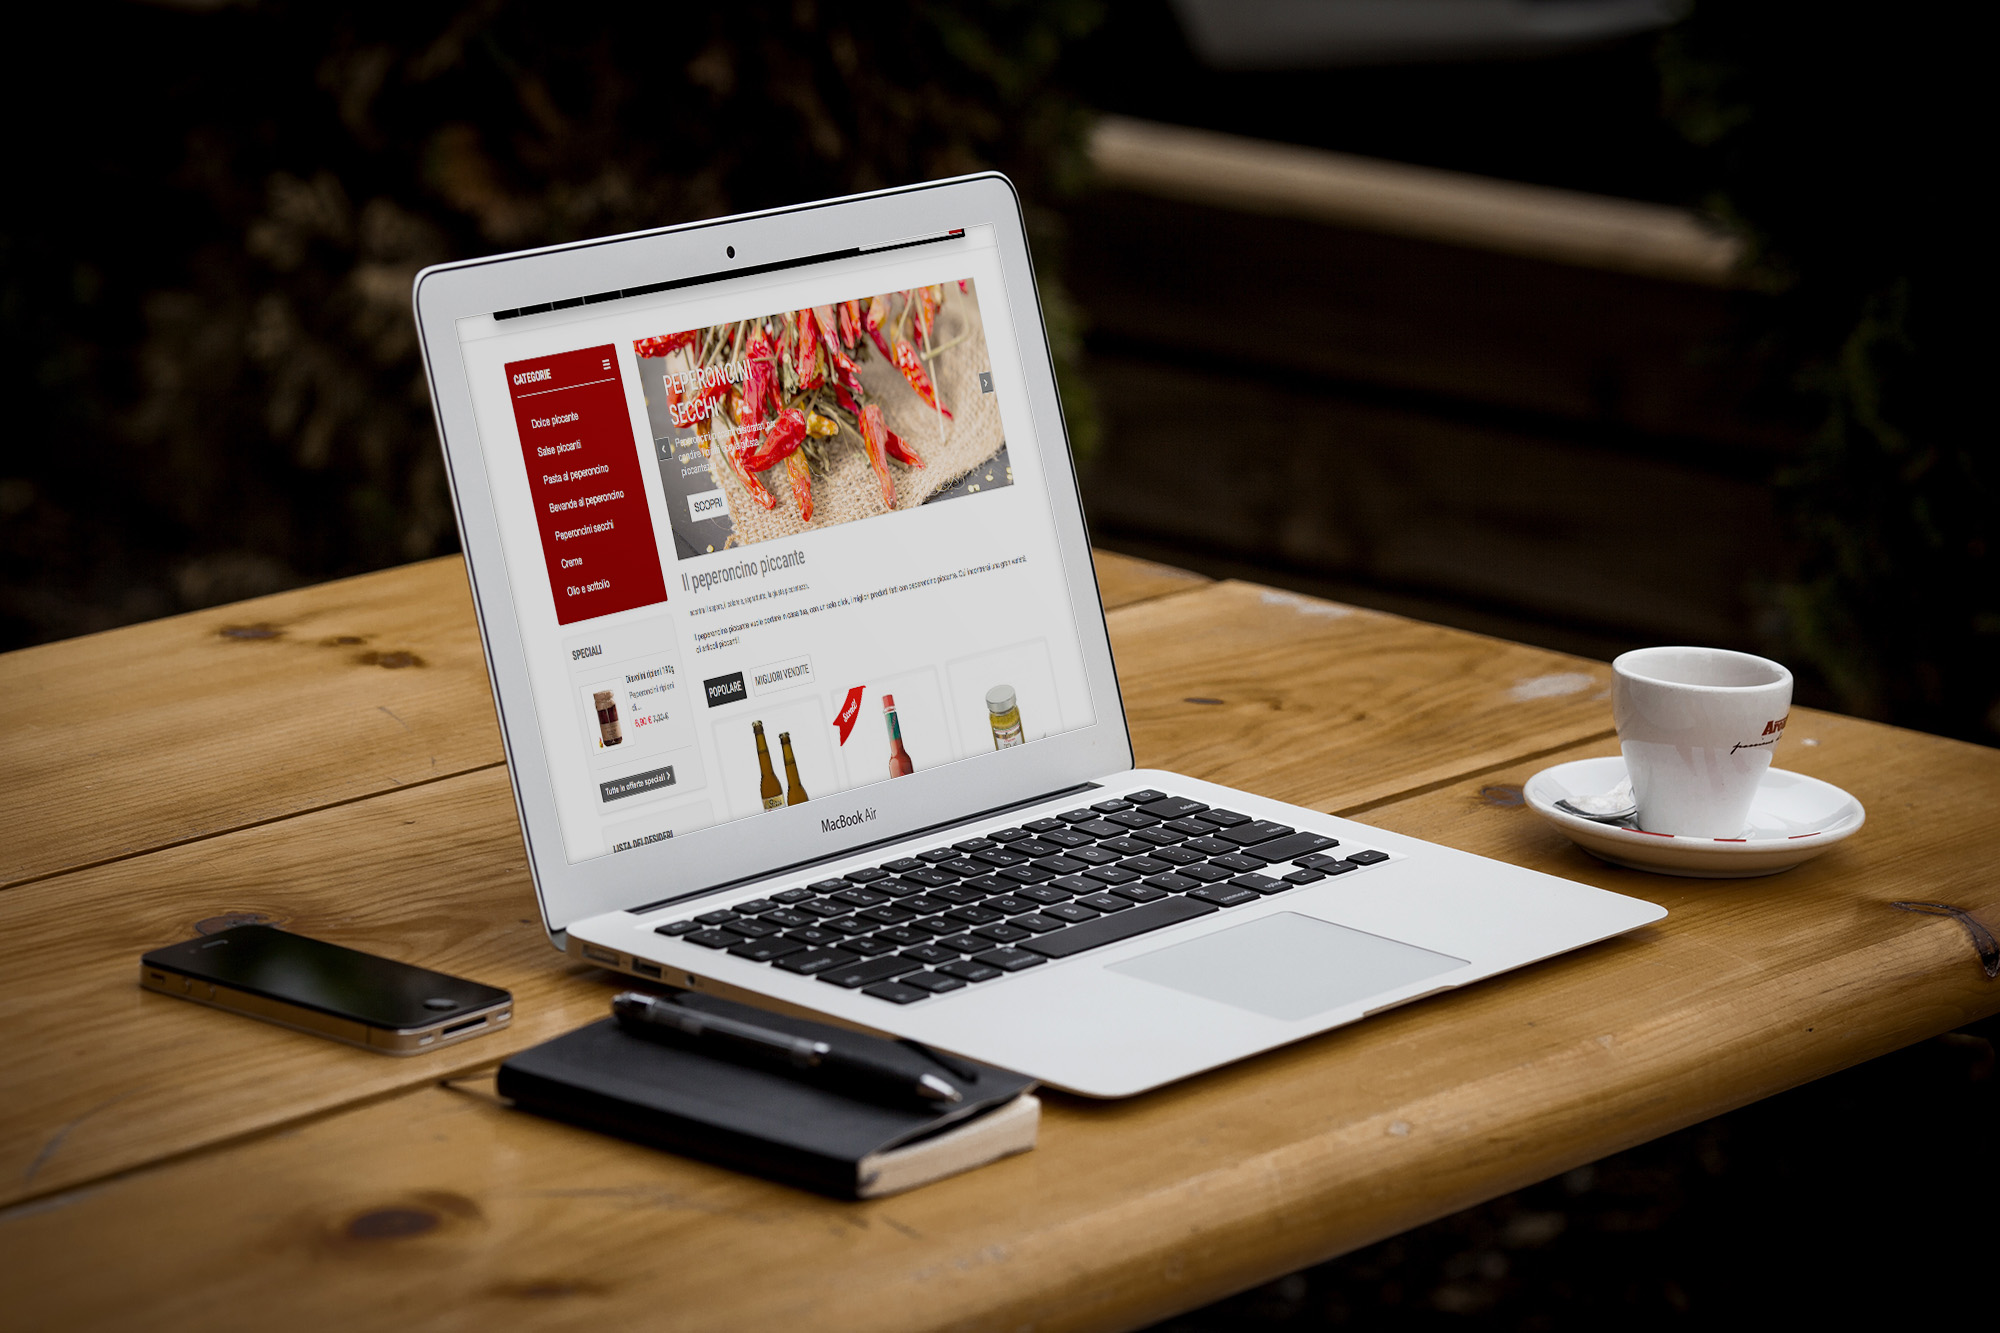 il peperoncino piccante shop online